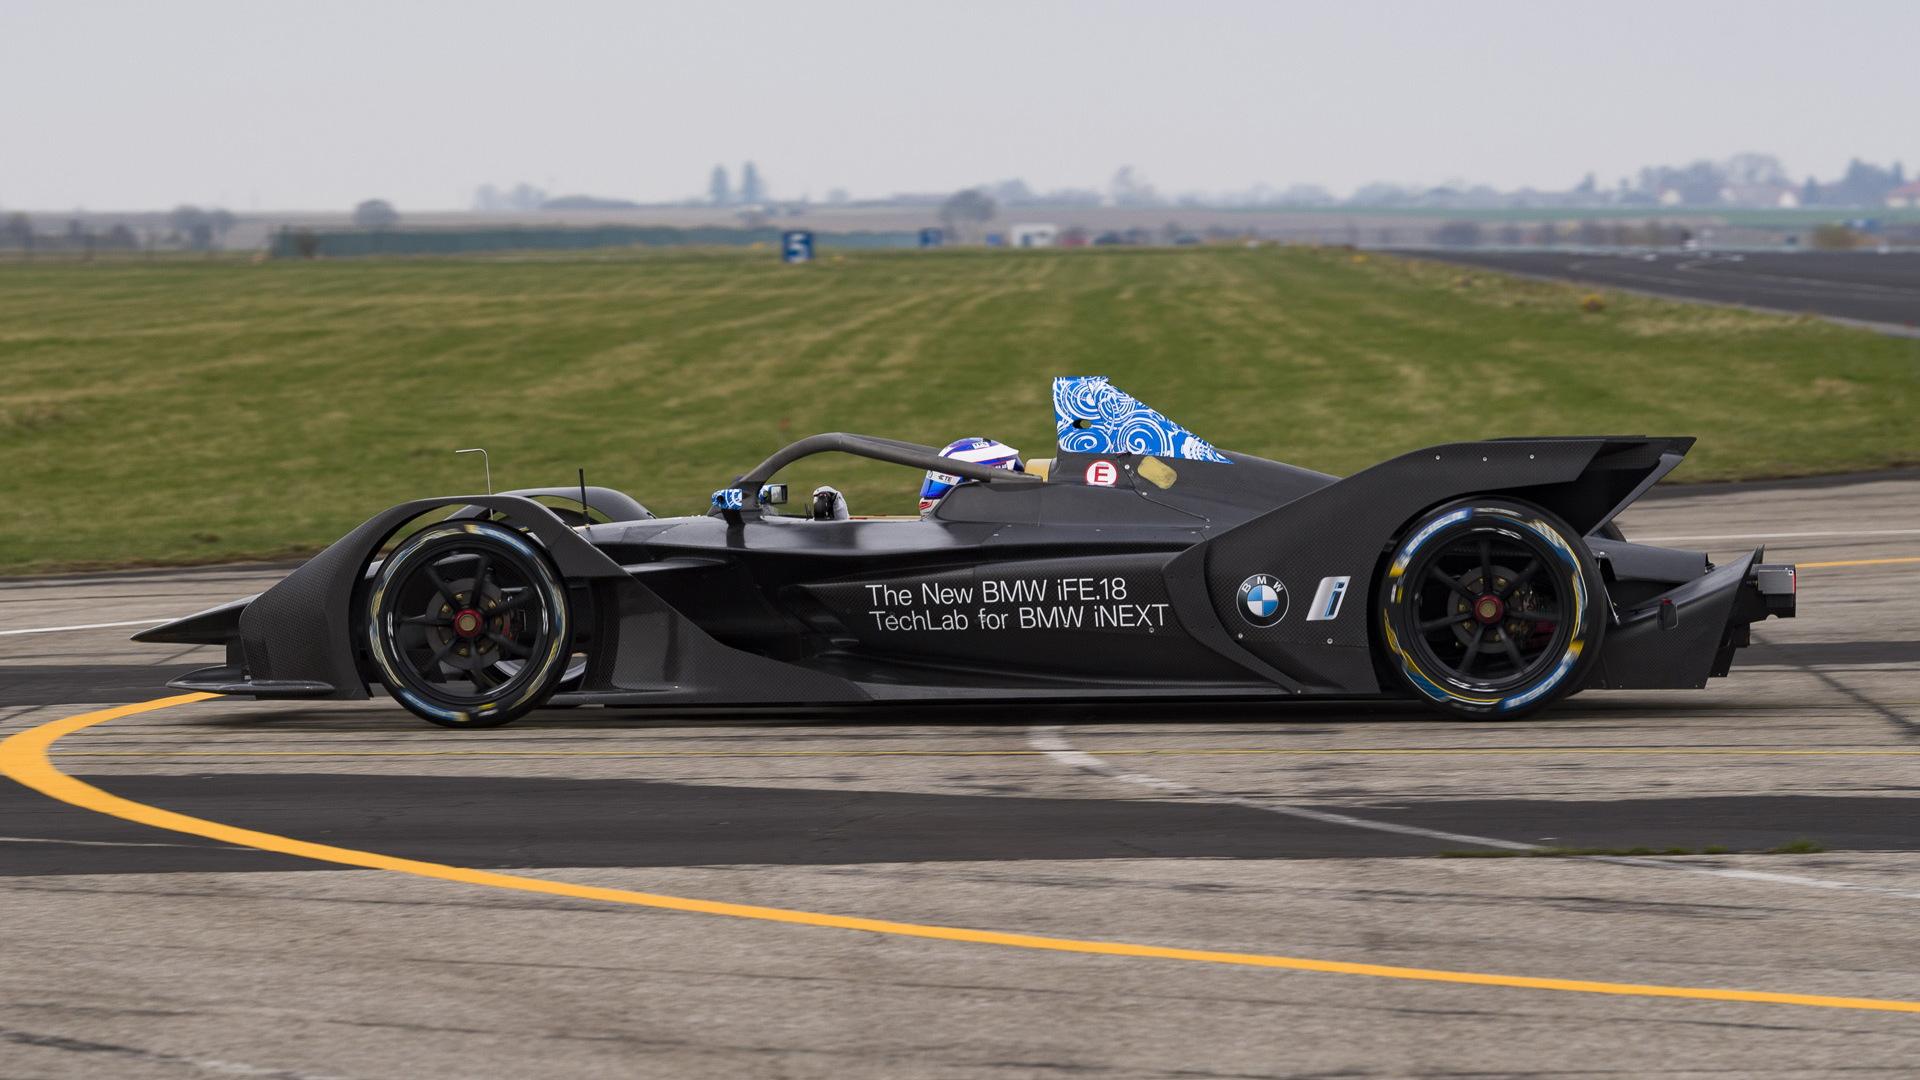 2018/2019 BMW iFE.18 Formula E race car